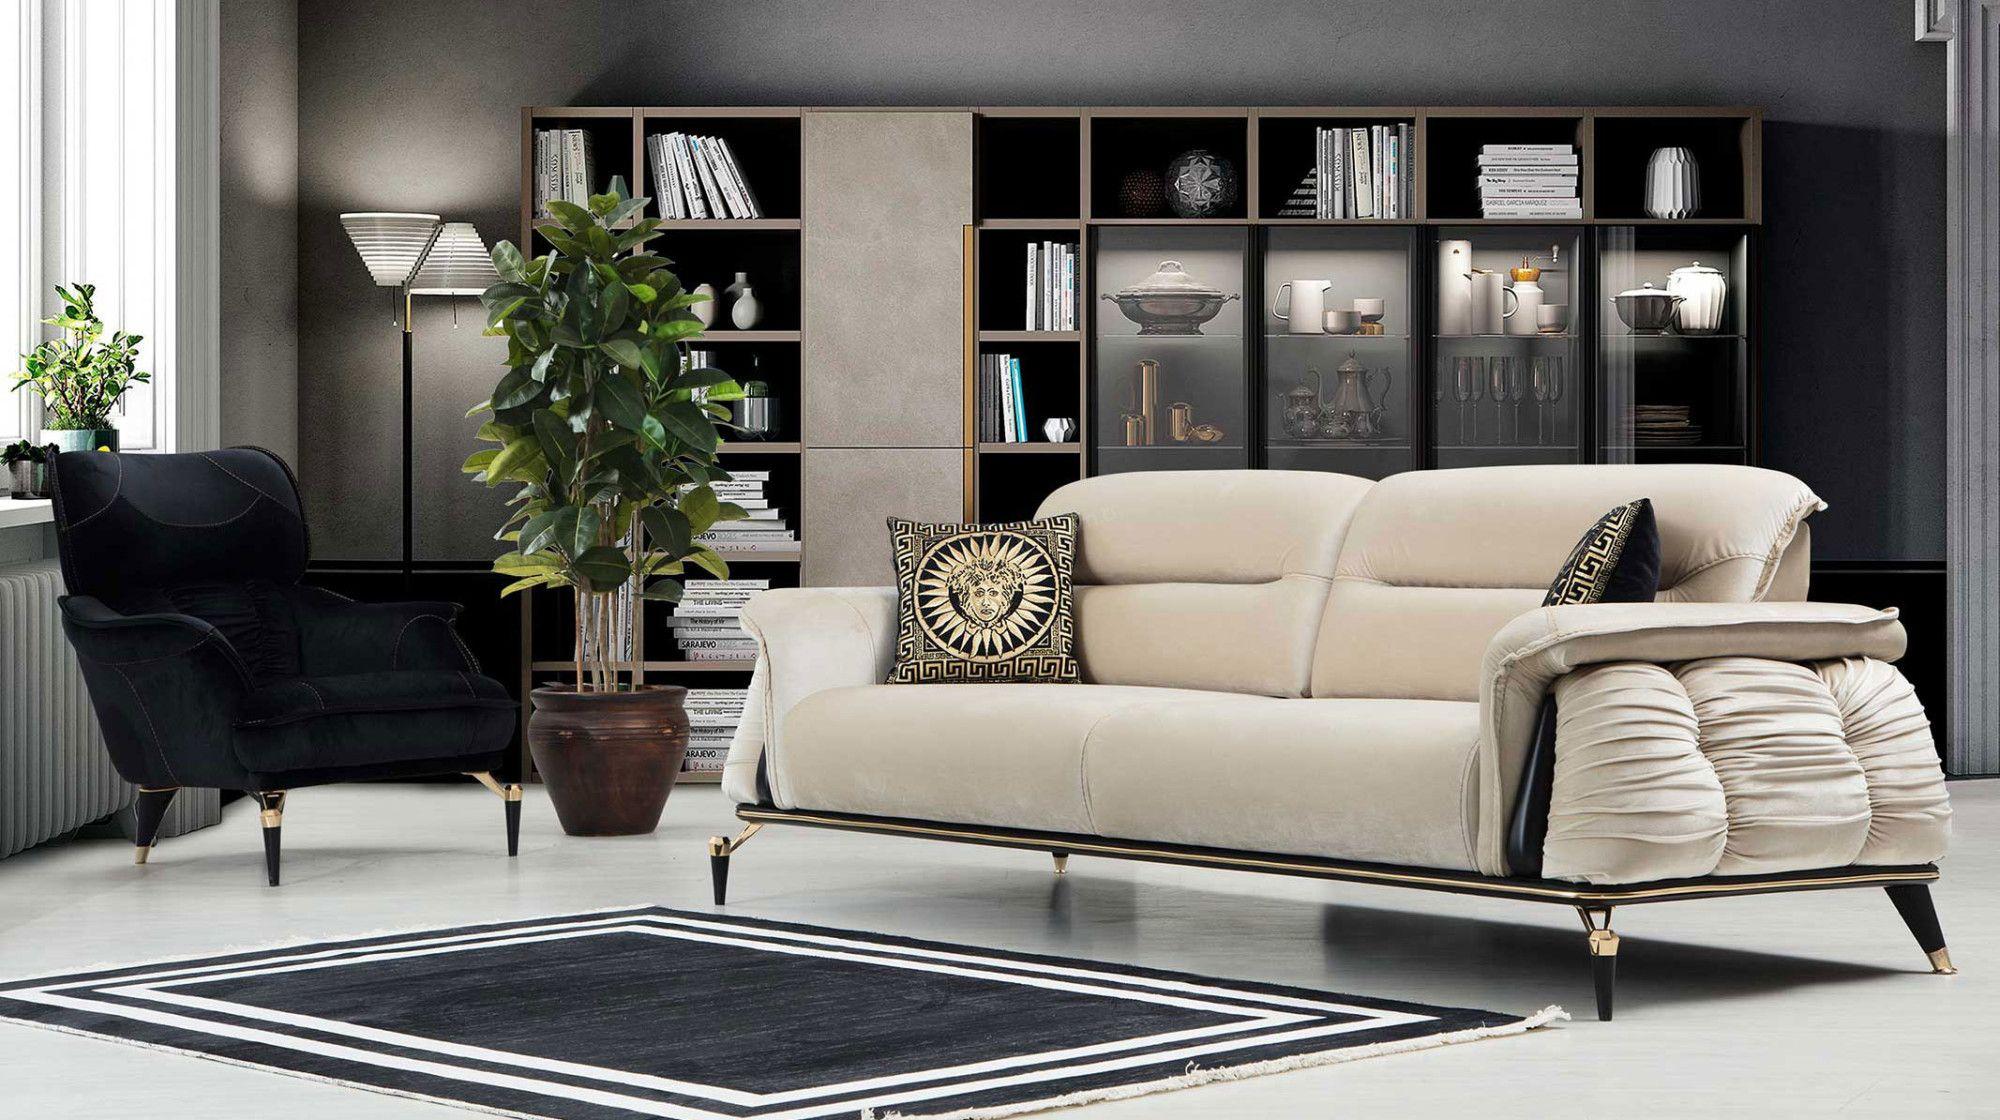 Mostar Luxury Koltuk Takimi 2020 Oturma Odasi Tasarimlari Mobilya Tasarimi Koltuklar